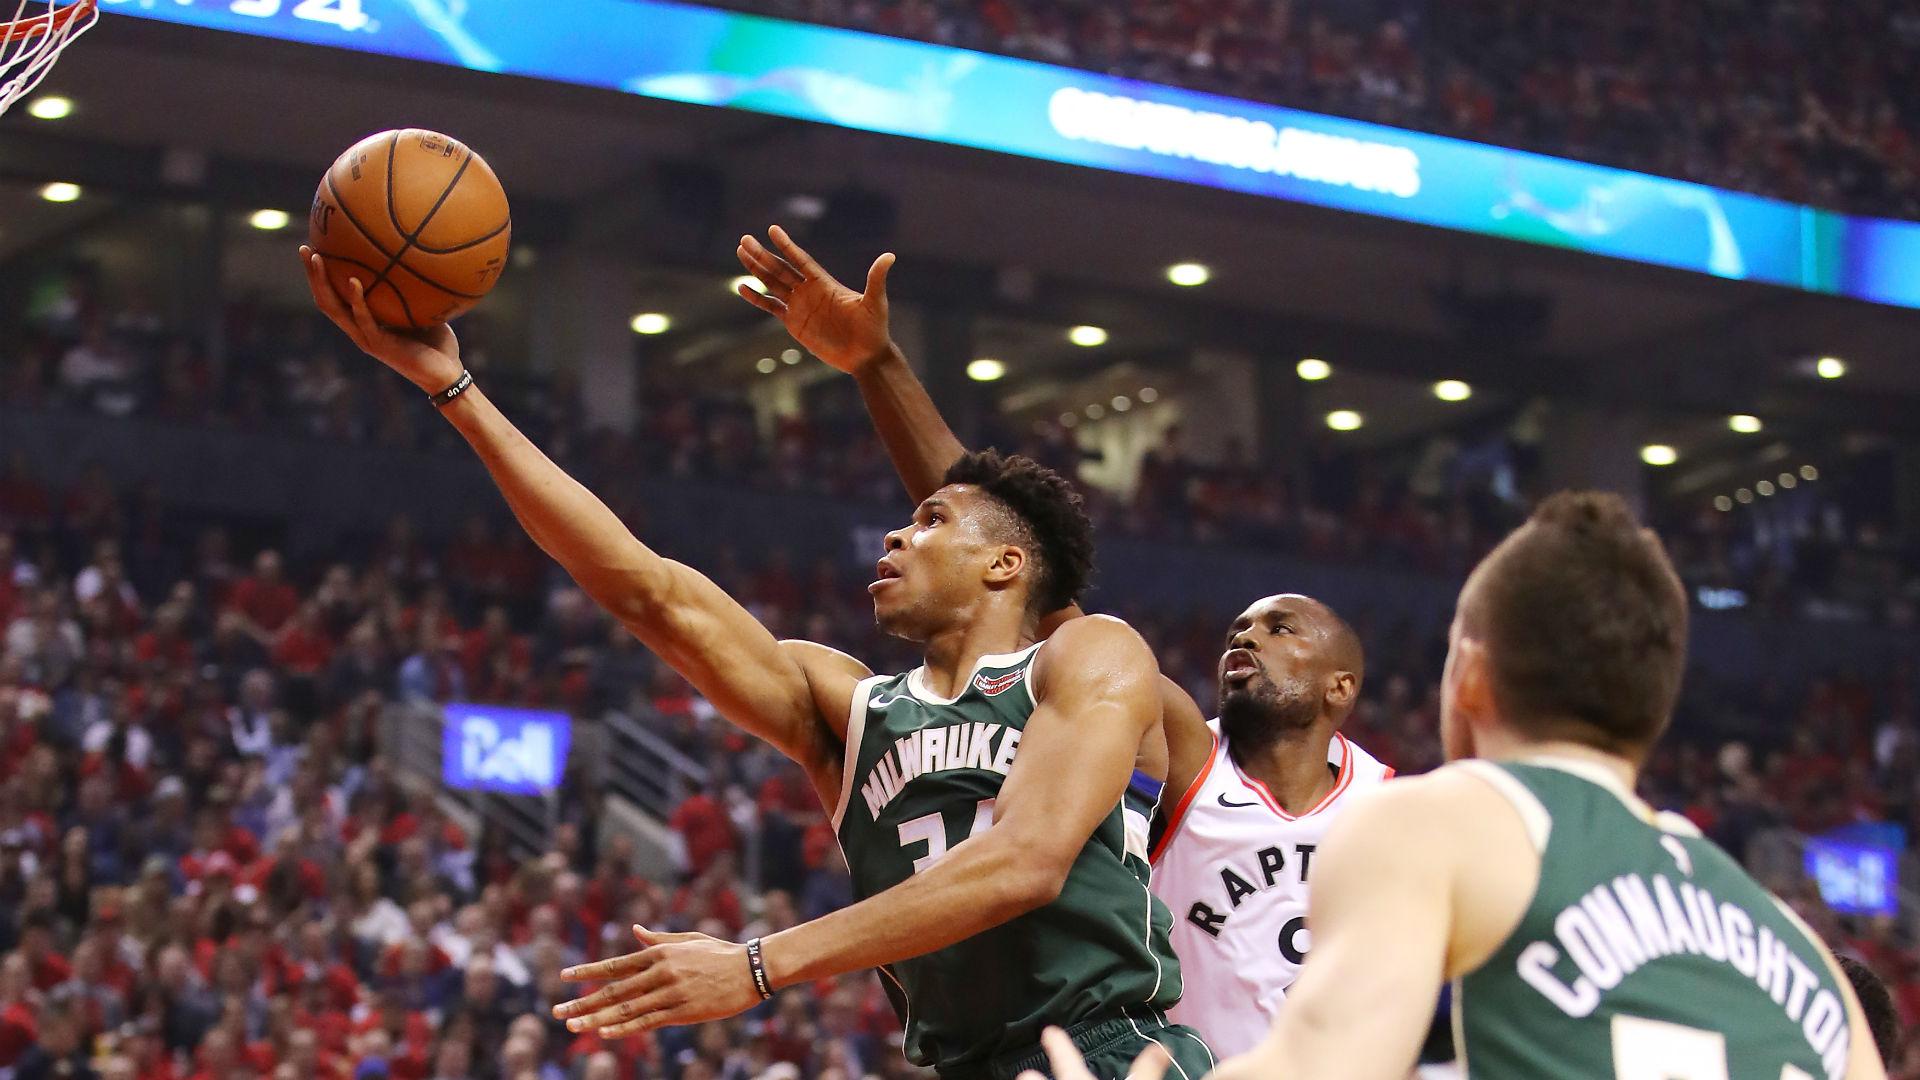 NBA playoffs 2019: Giannis Antetokounmpo isn't feeling pressure despite Raptors' revival